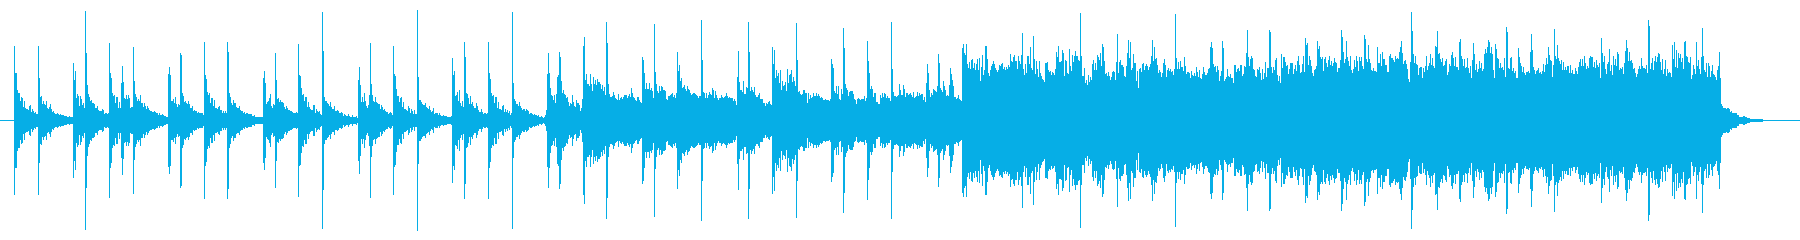 CM向けロックアンセム30秒歌tmb無版の再生済みの波形